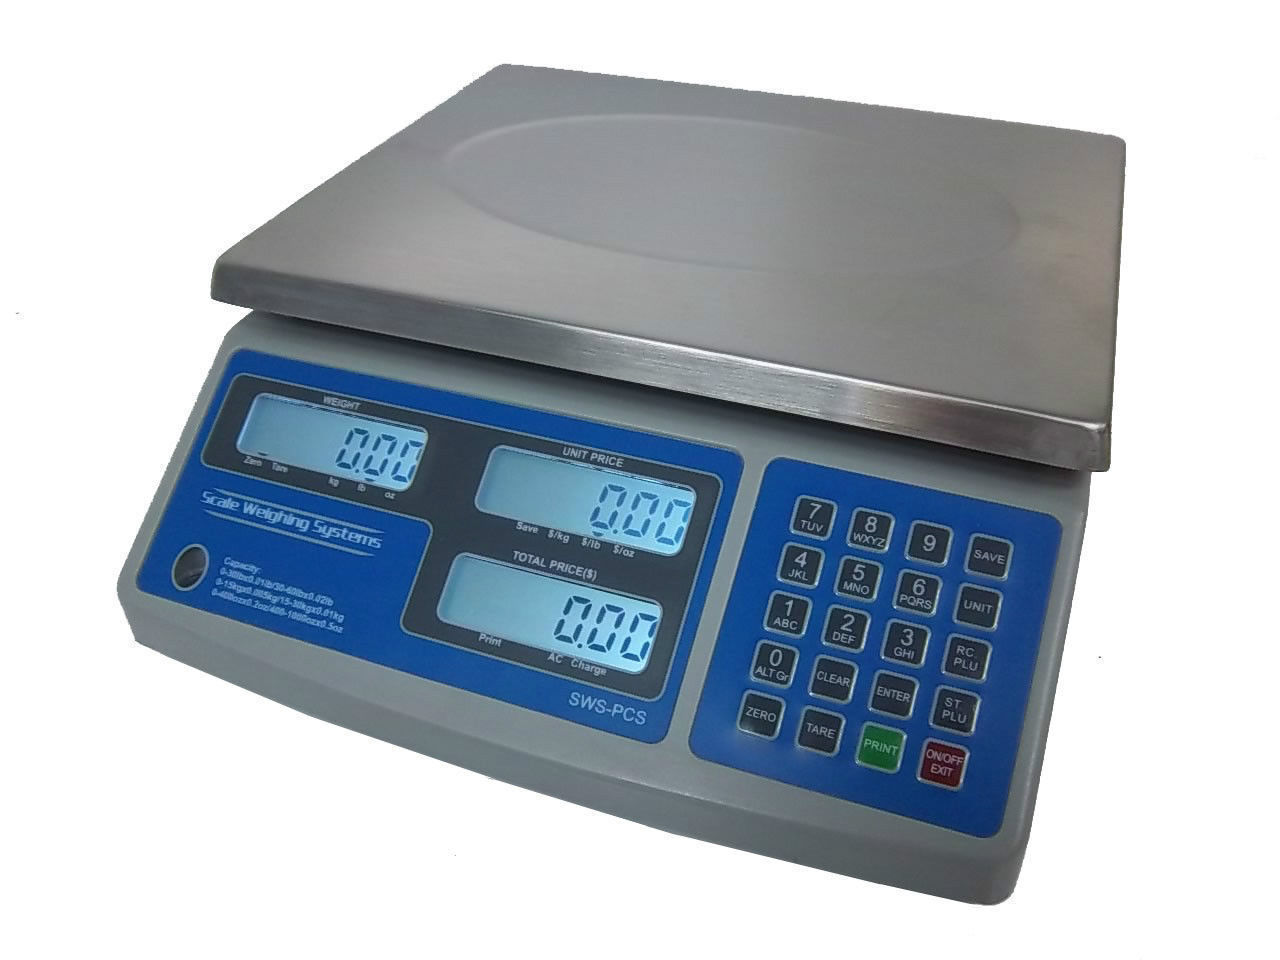 SWS-PCS-60 lb Price Computing Scale-lbs,kgs,oz Barcode Printer Thermal Label